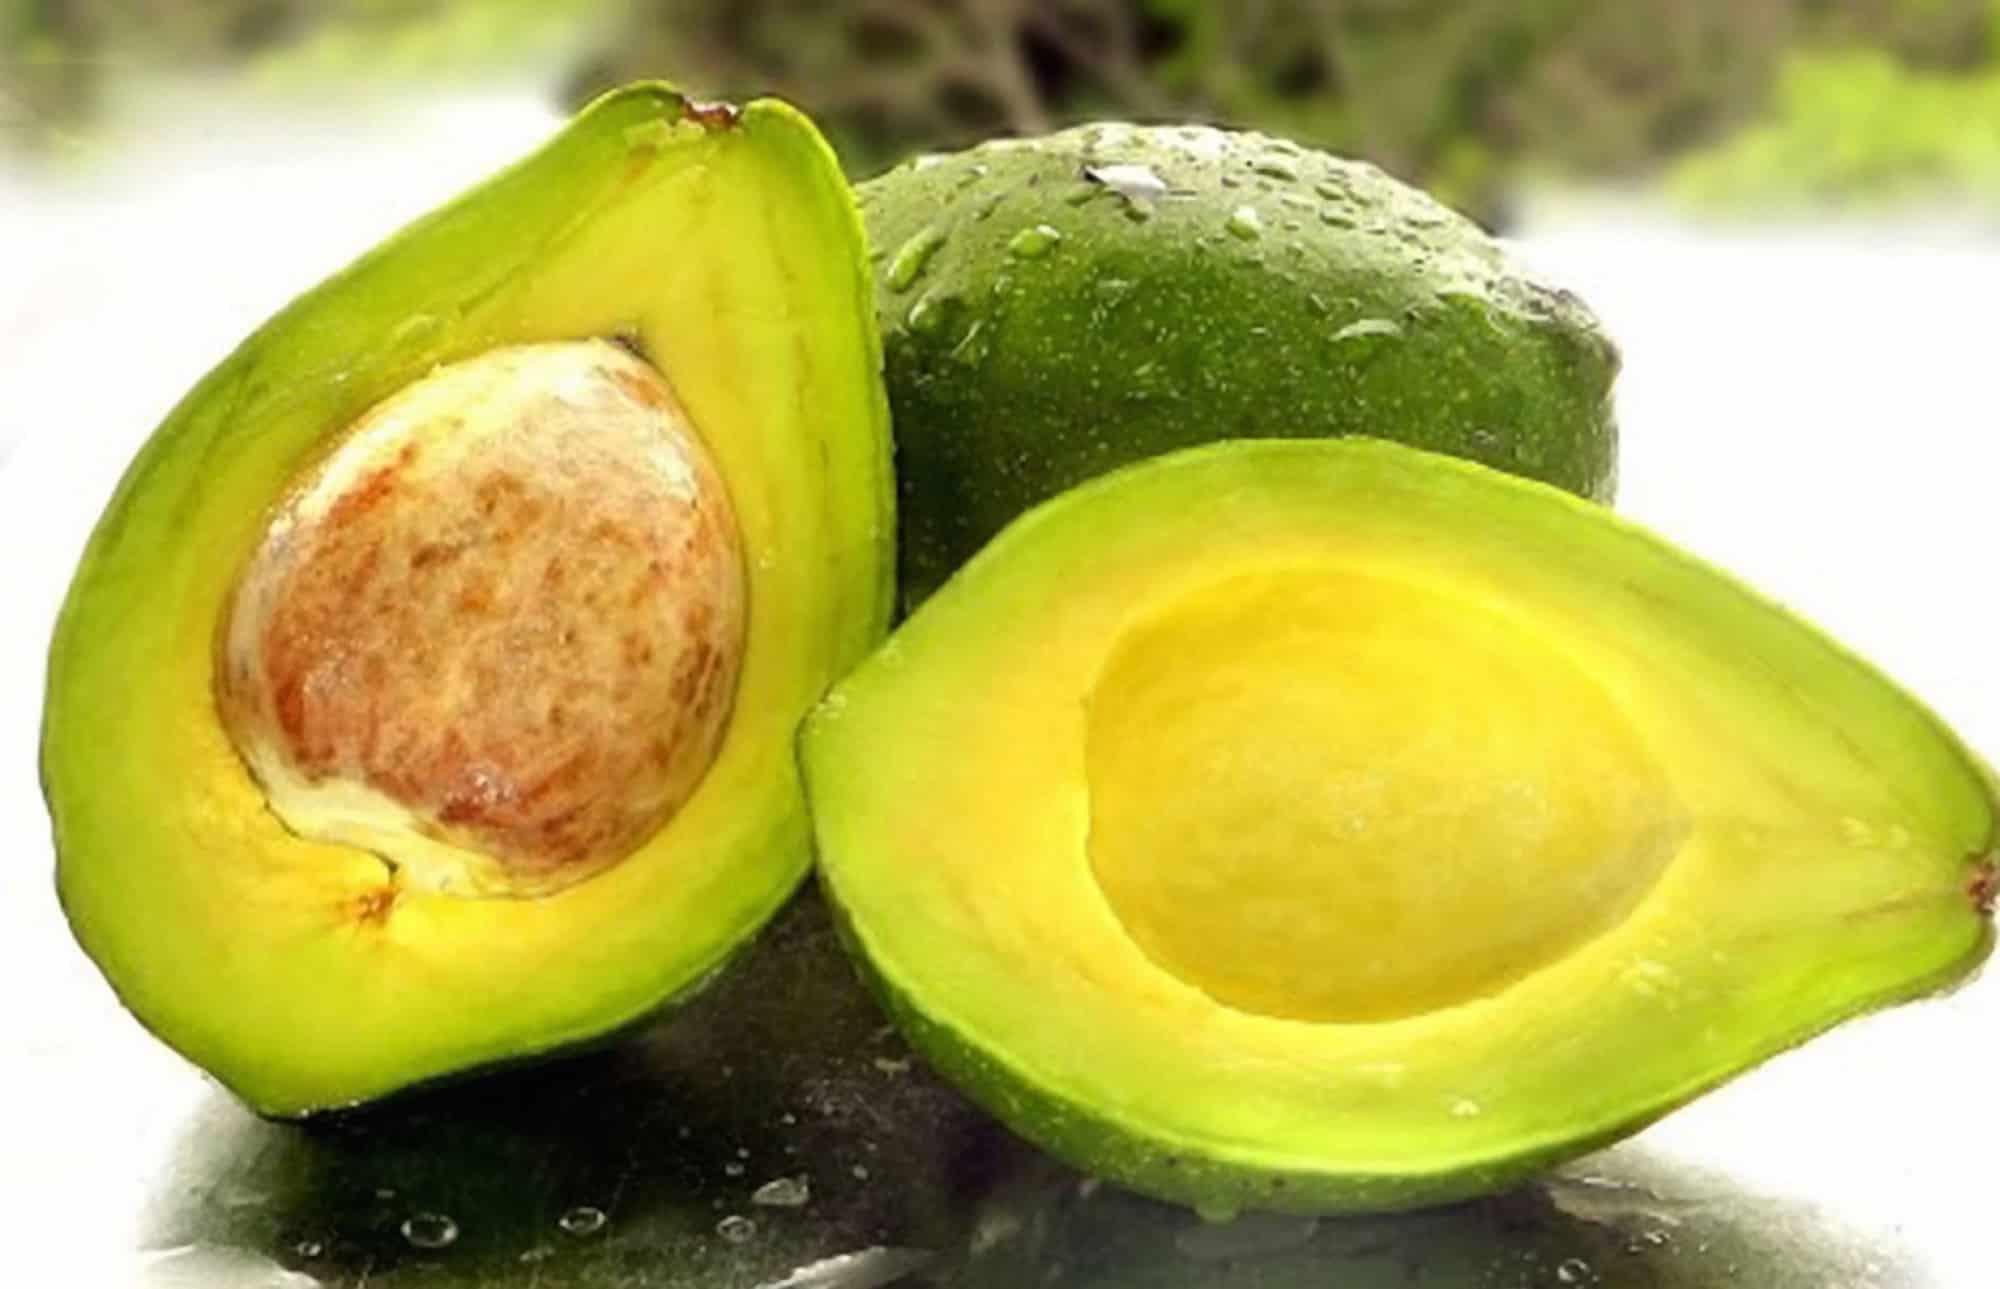 Hass avocado from Mexico